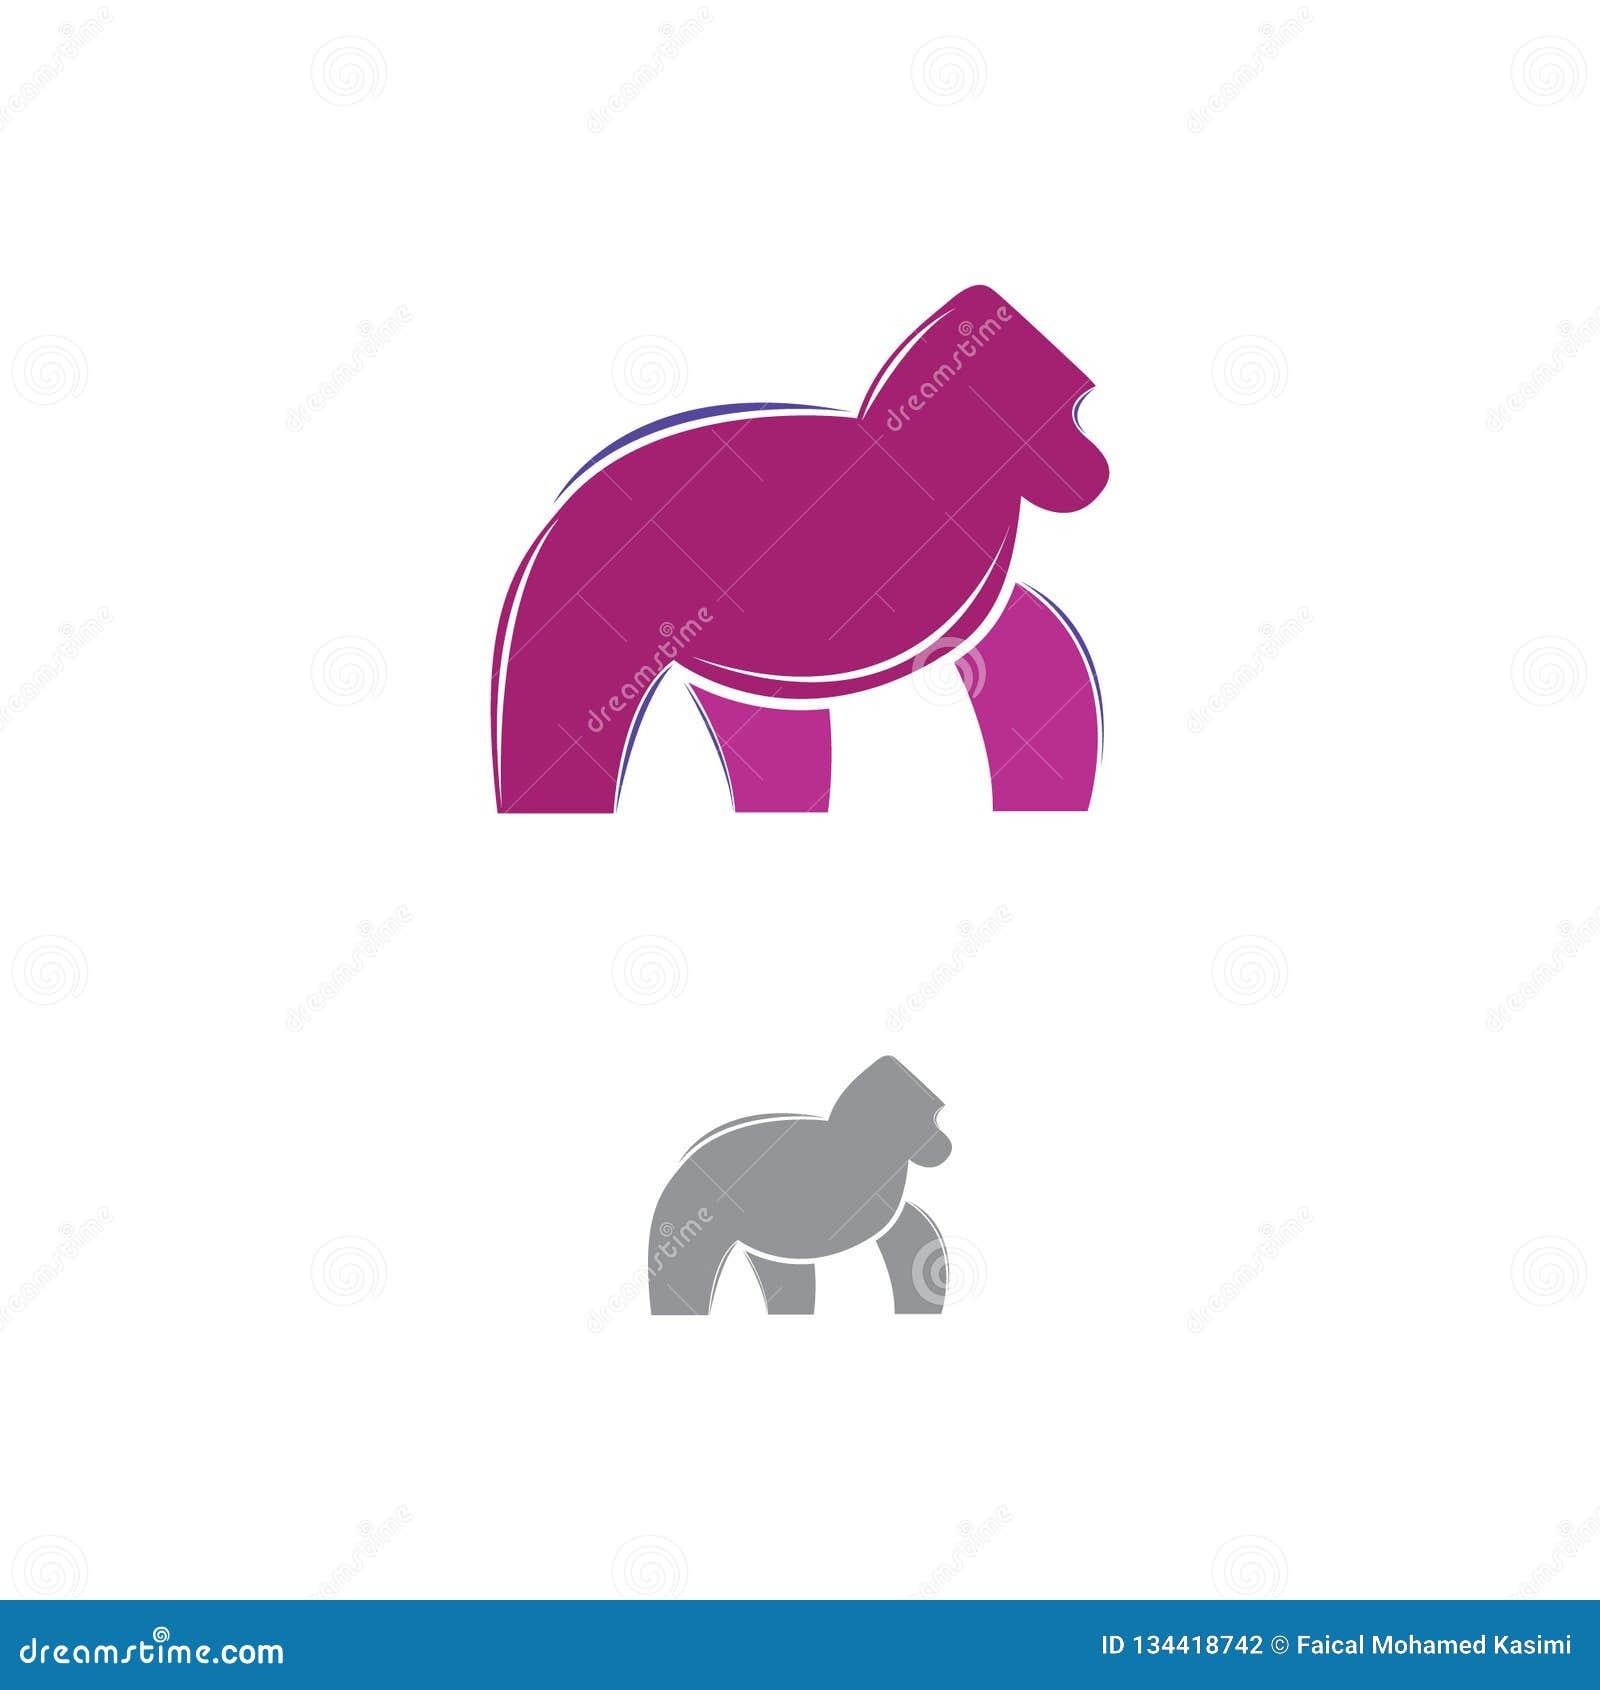 Gorilla Logo Design 2019 New Year Stock Illustration Illustration Of Studio Gorilla 134418742